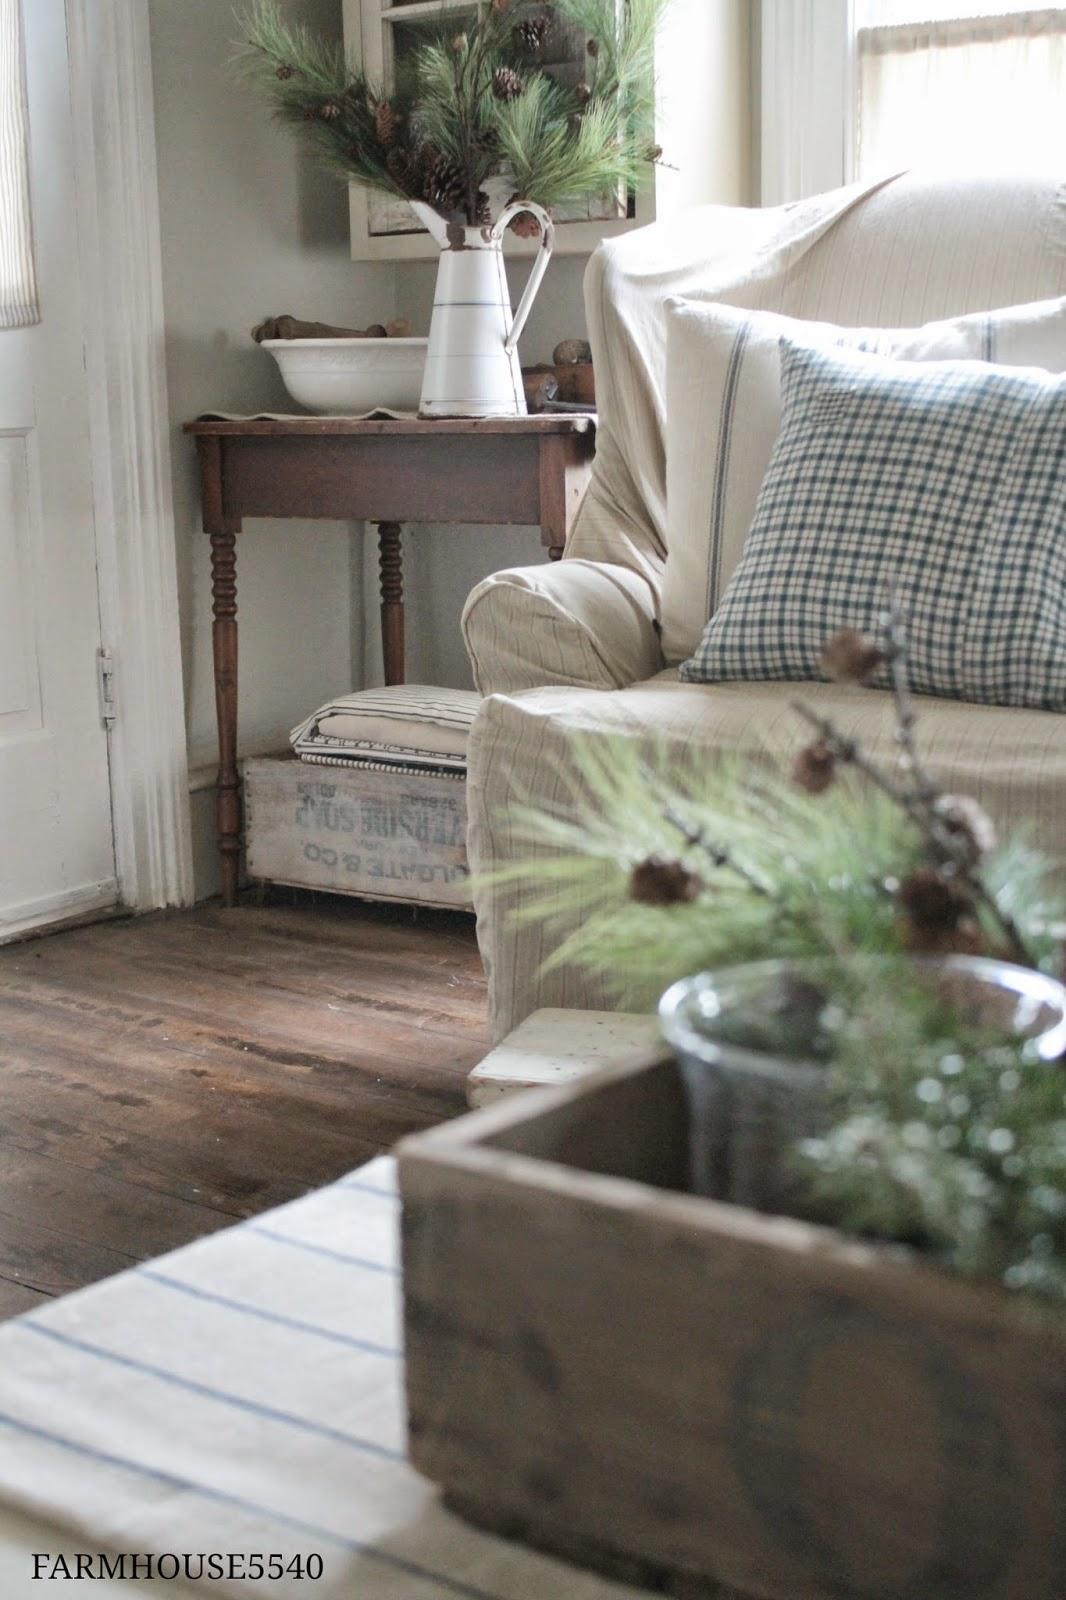 Farmhouse Decor For Living Rooms: FARMHOUSE 5540: Christmas Decorating Sneak Peek